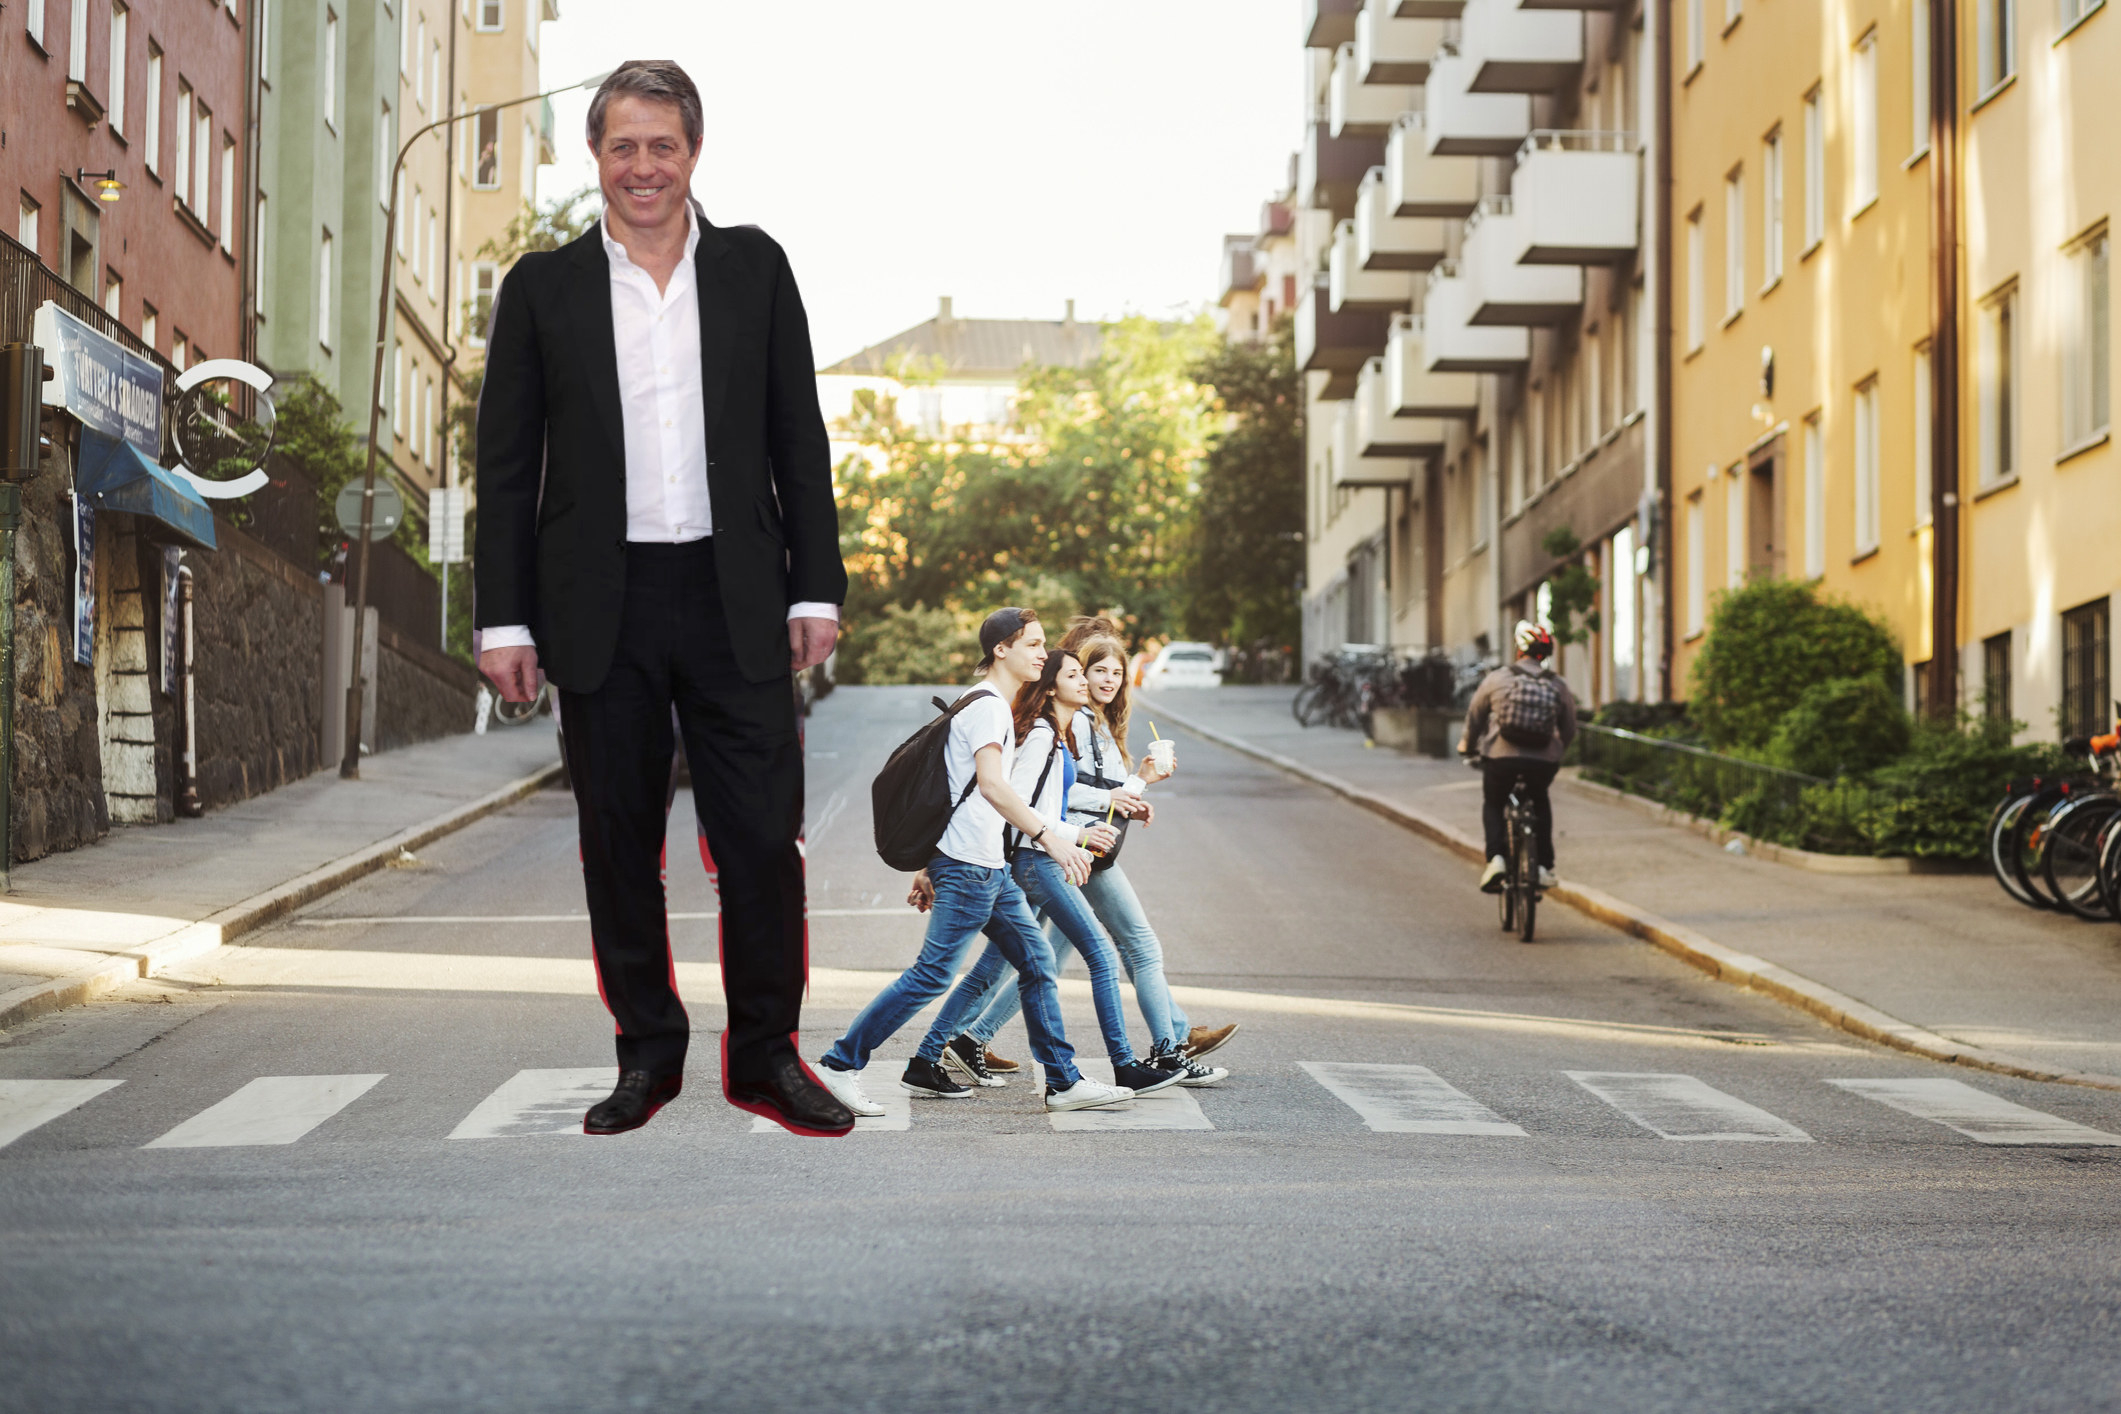 Giant Hugh next to average size people